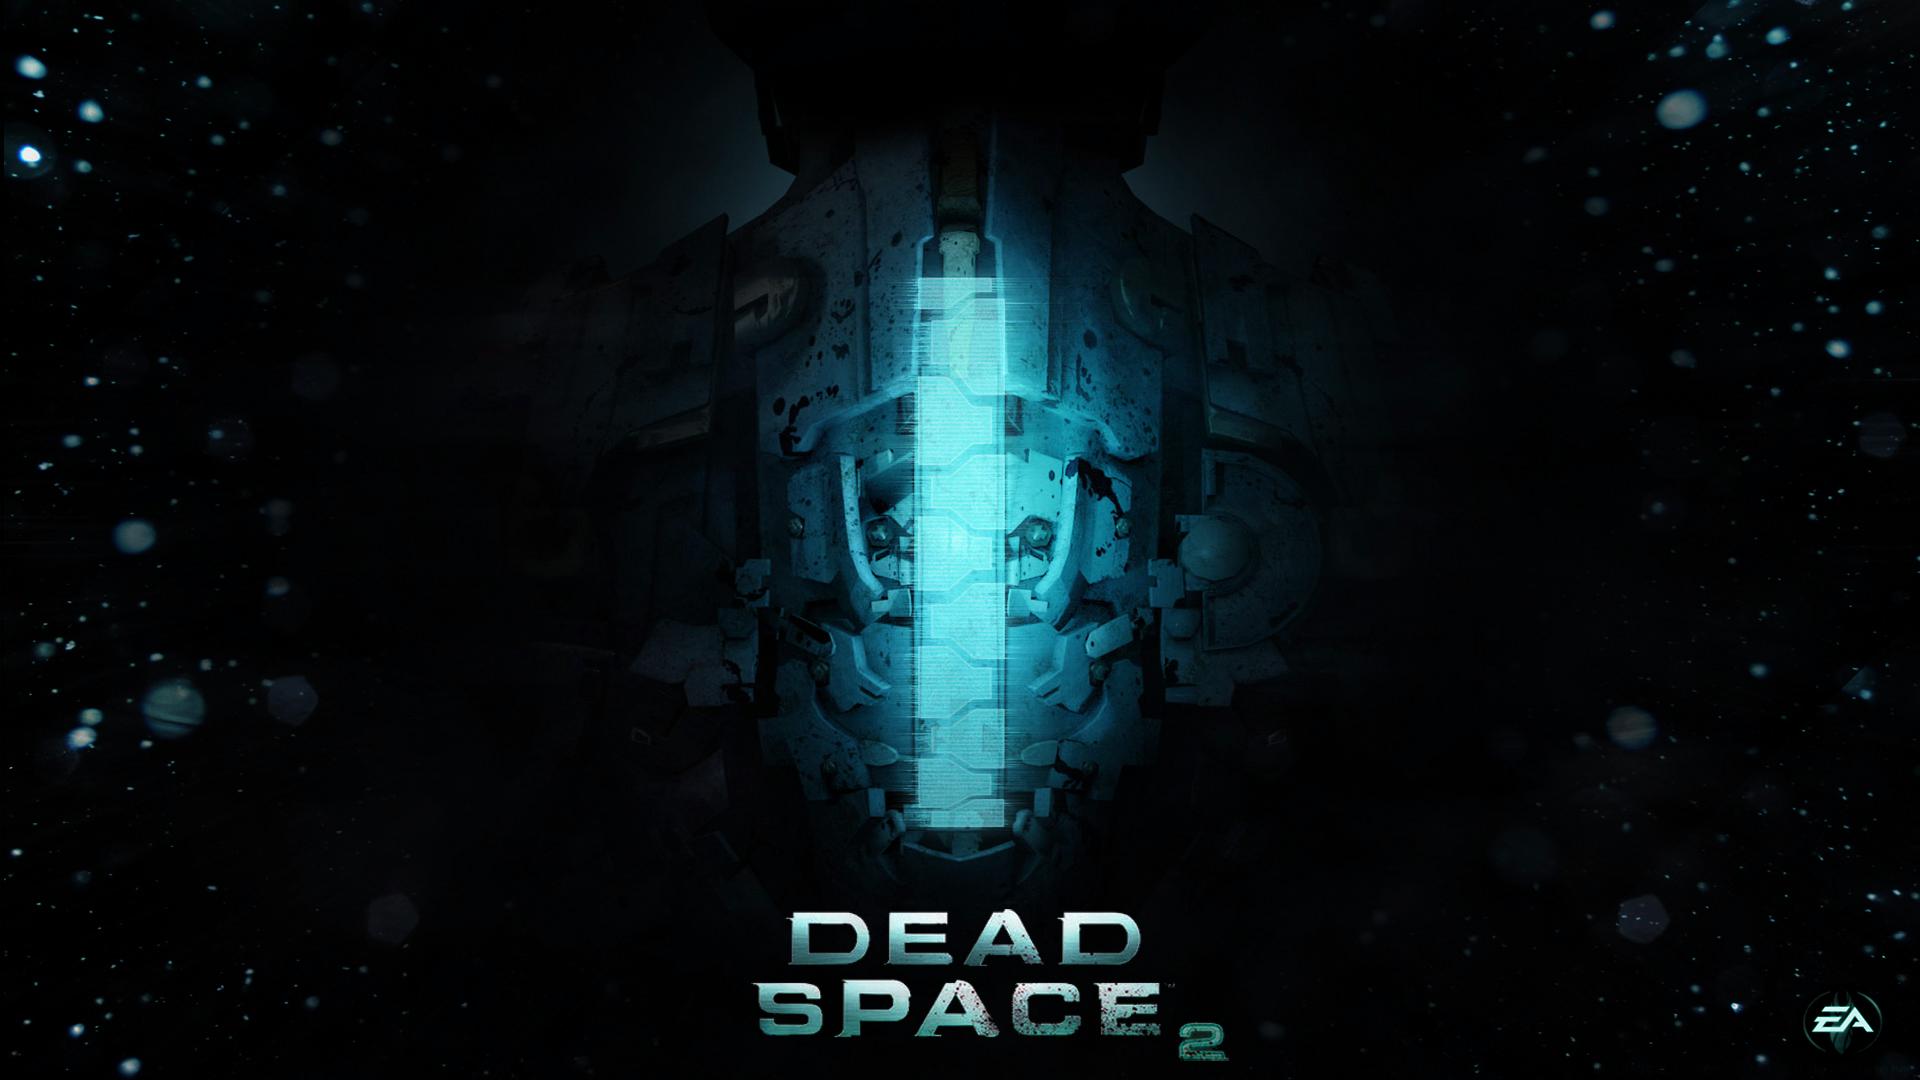 Dead Space 2 1080p By Ultimattehd On Deviantart